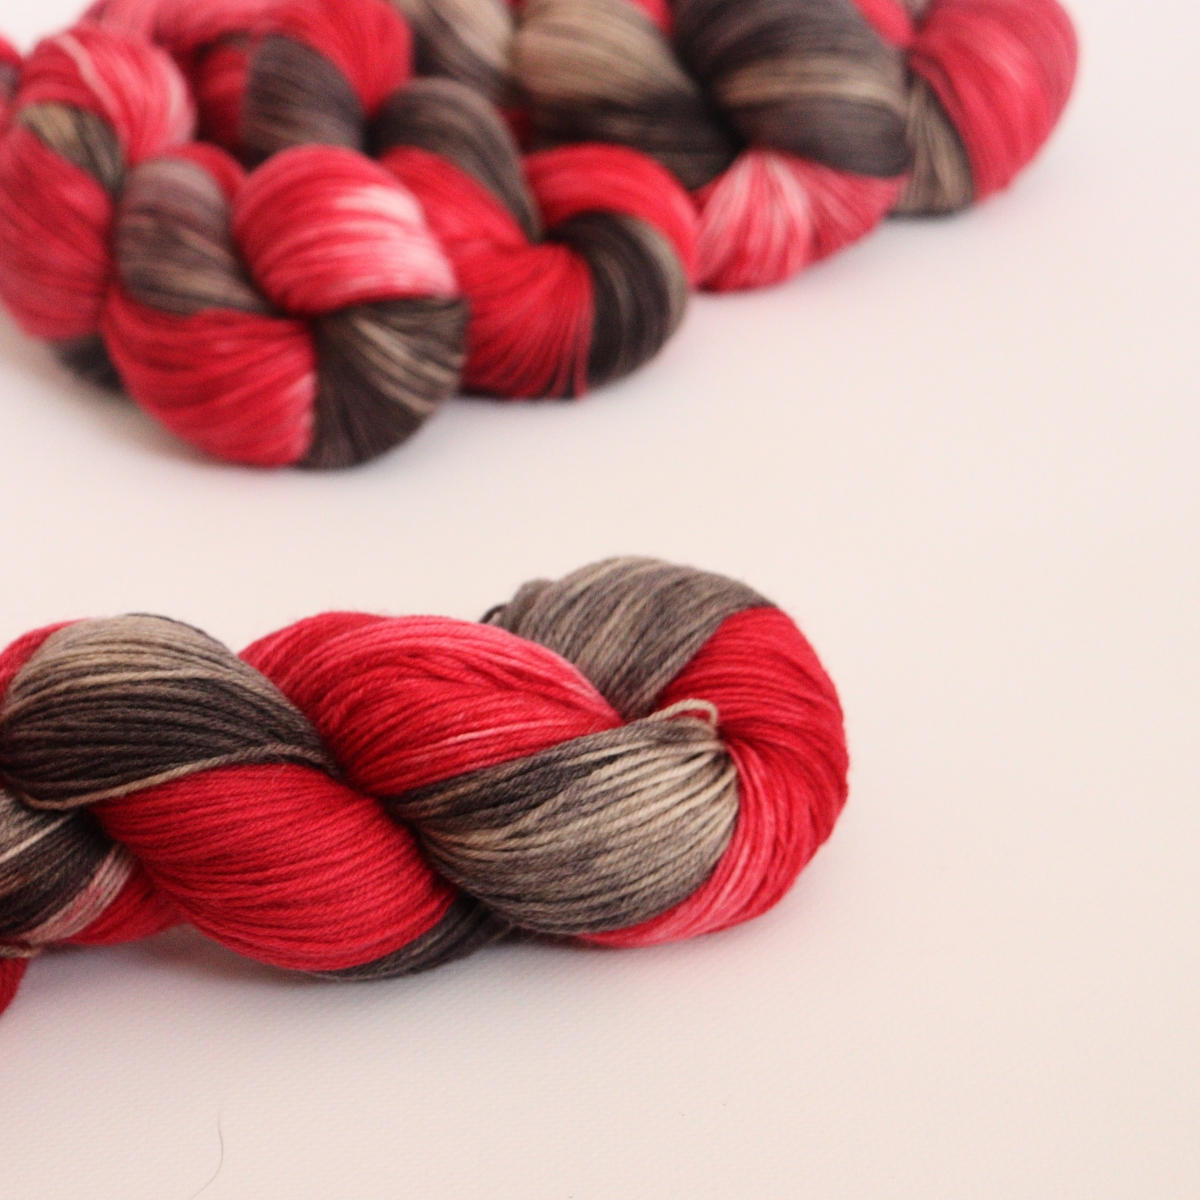 woodico.pro hand dyed yarn 056 2 1200x1200 - Hand dyed yarn / 056